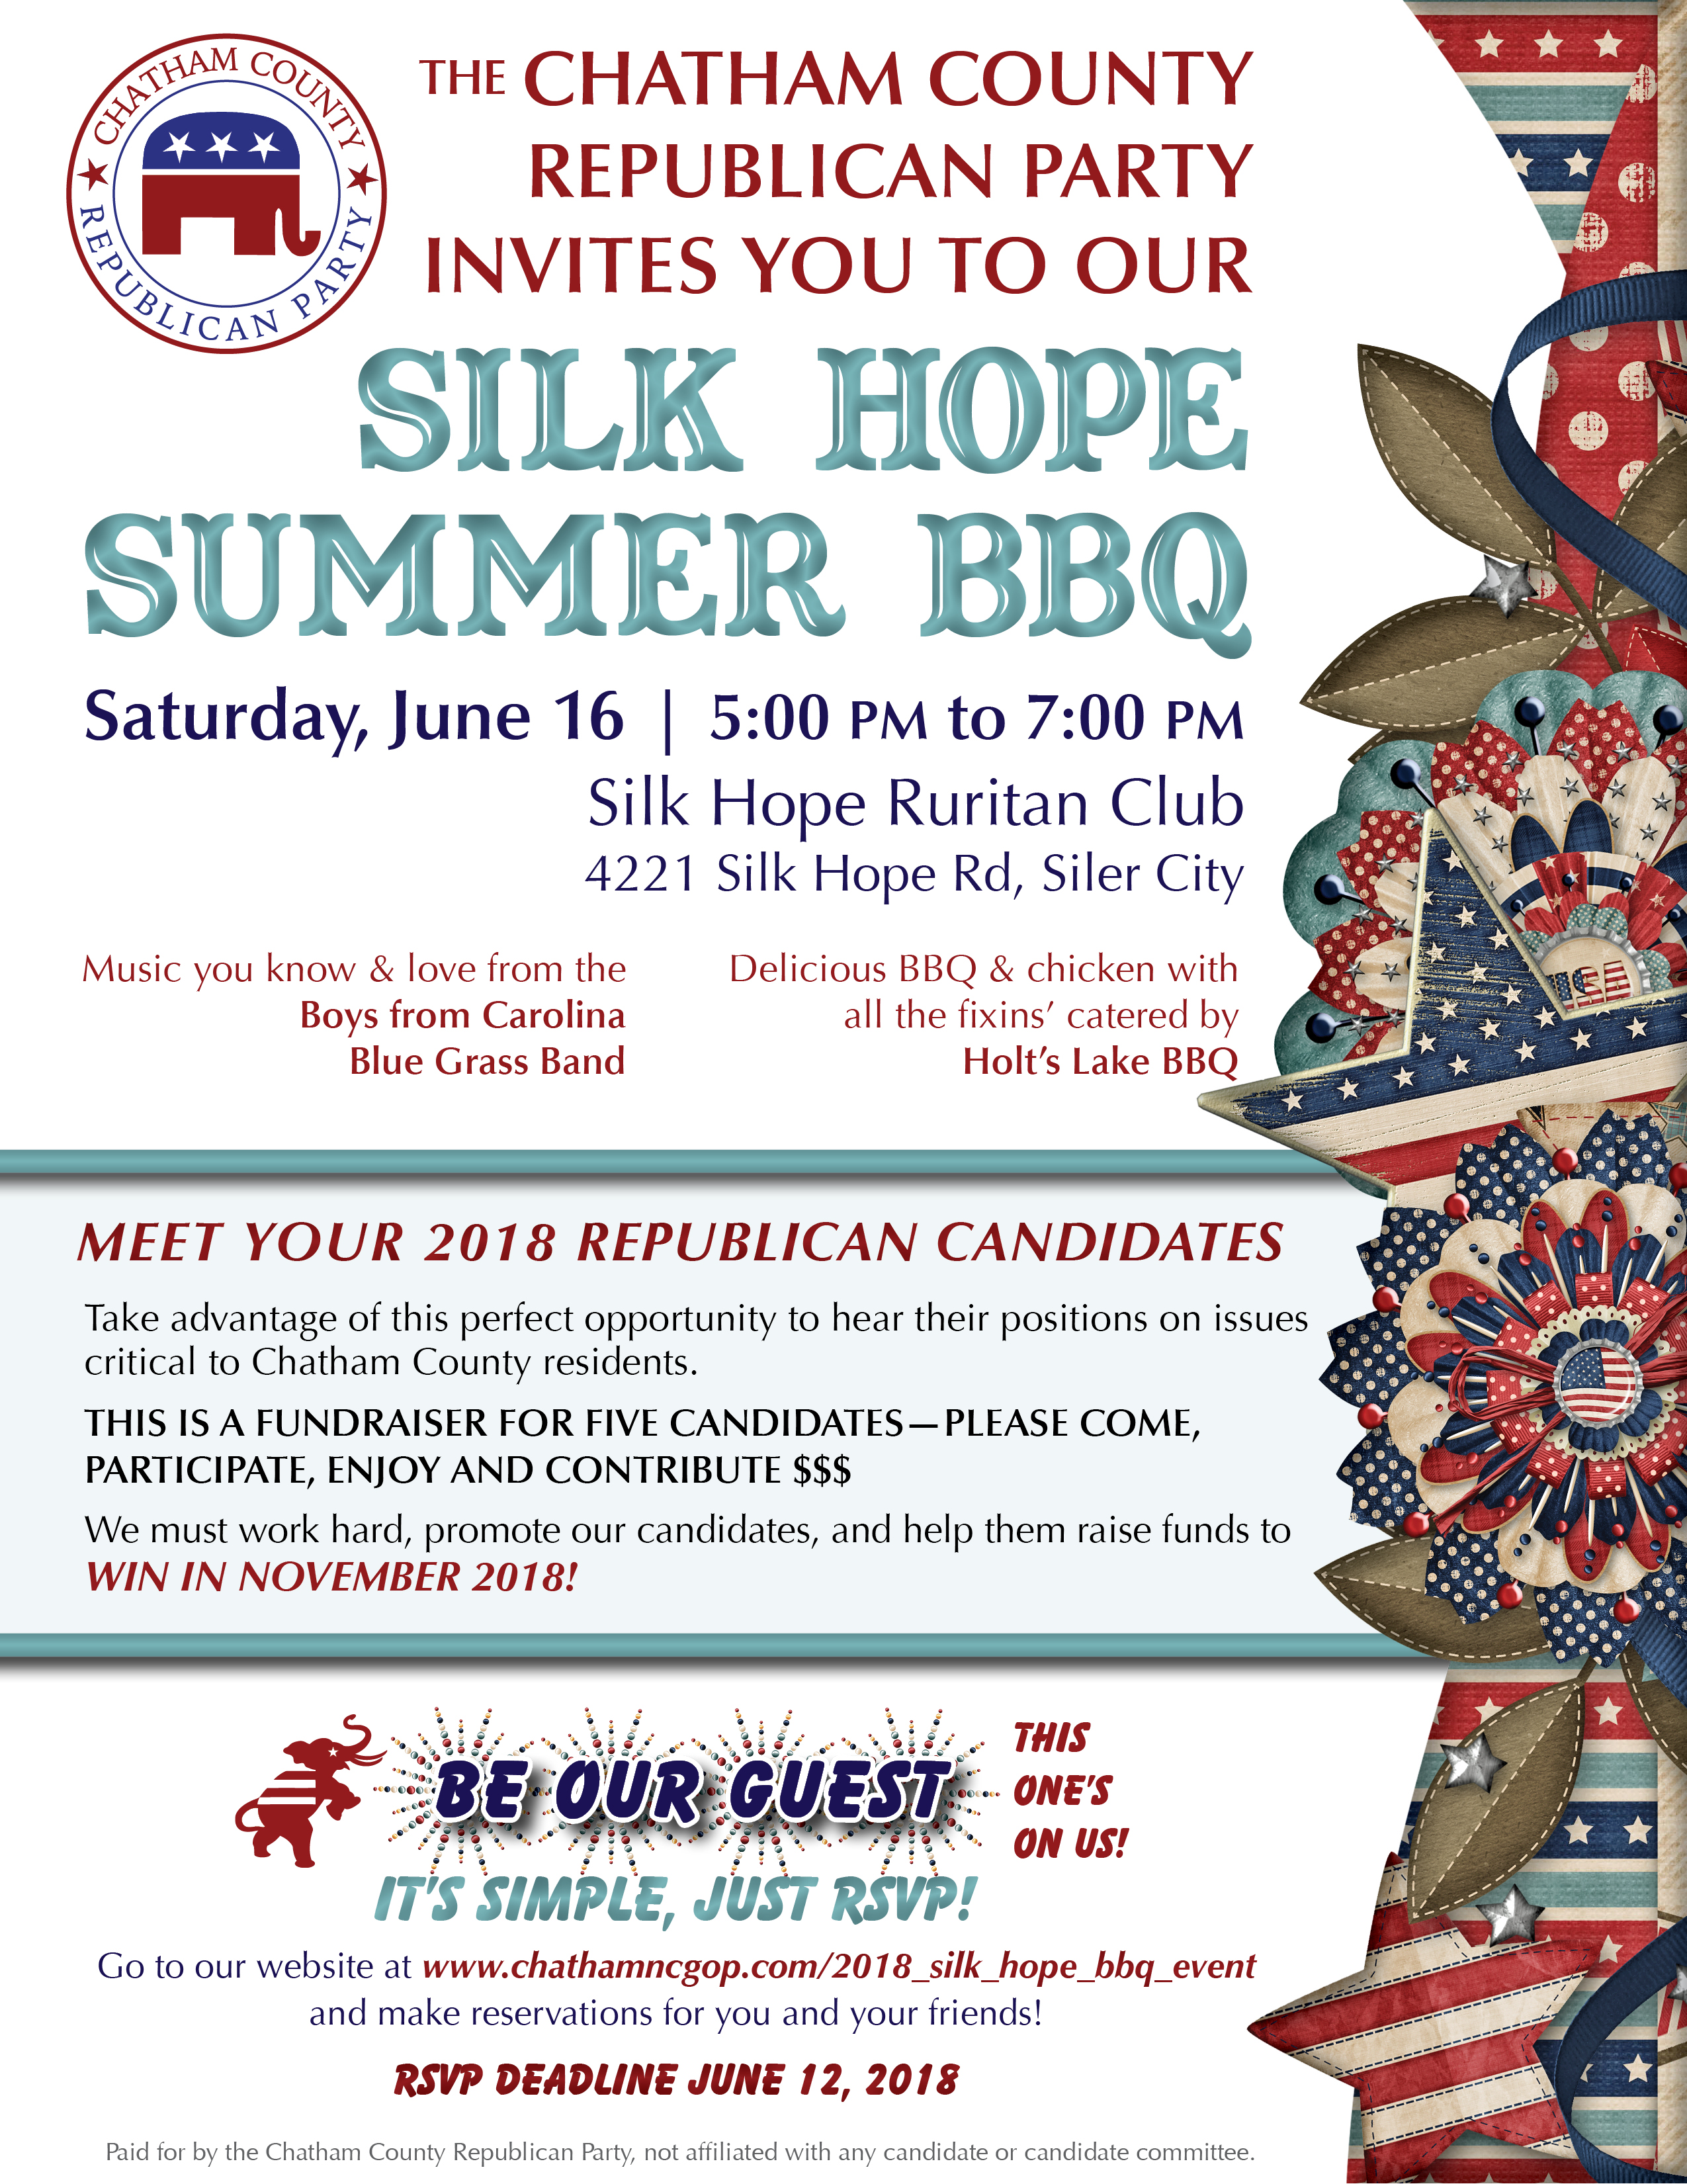 Silk_Hope_BBQ_2018_Invitation.jpg